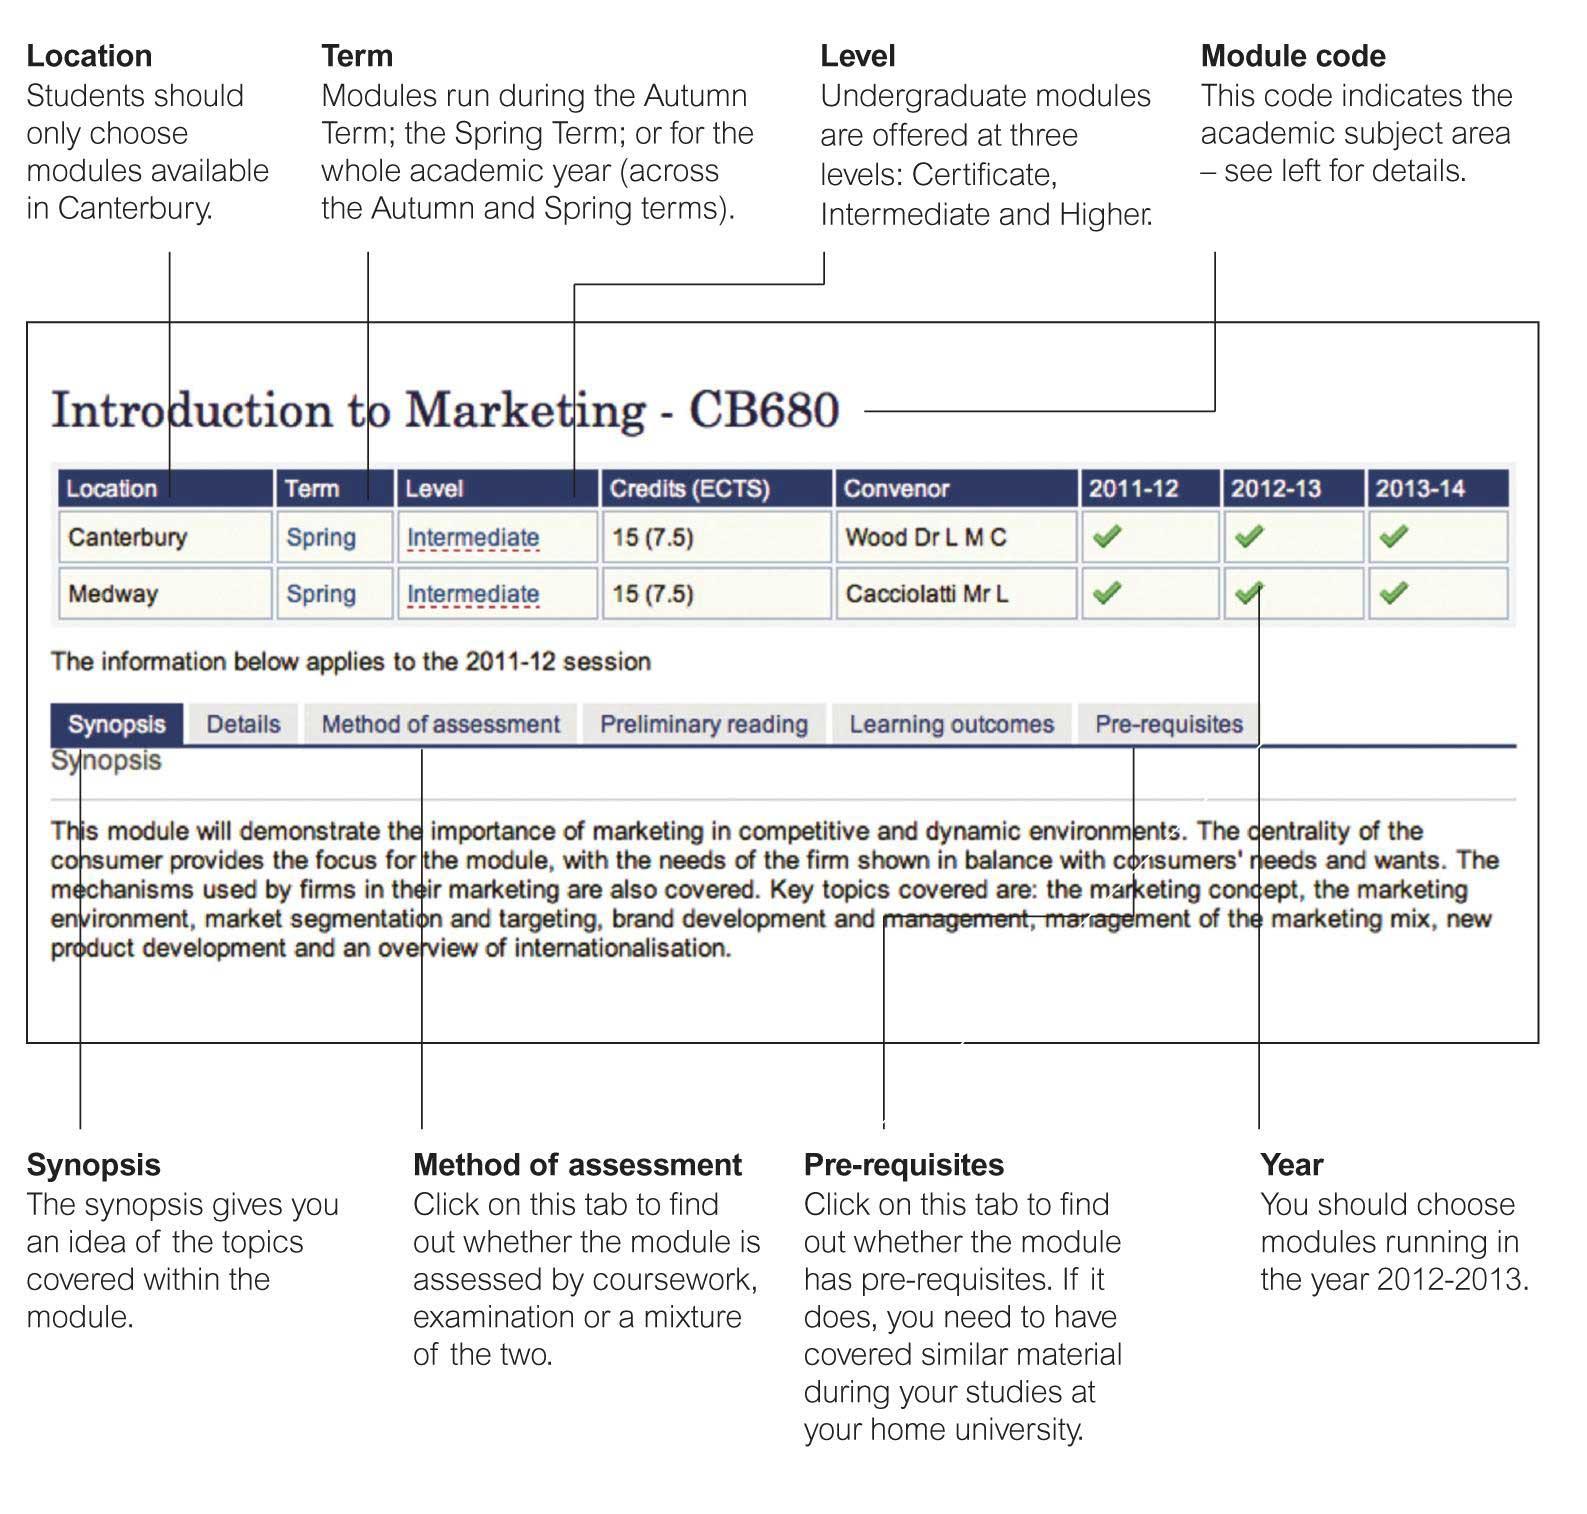 Choosing Modules - Short-term Study